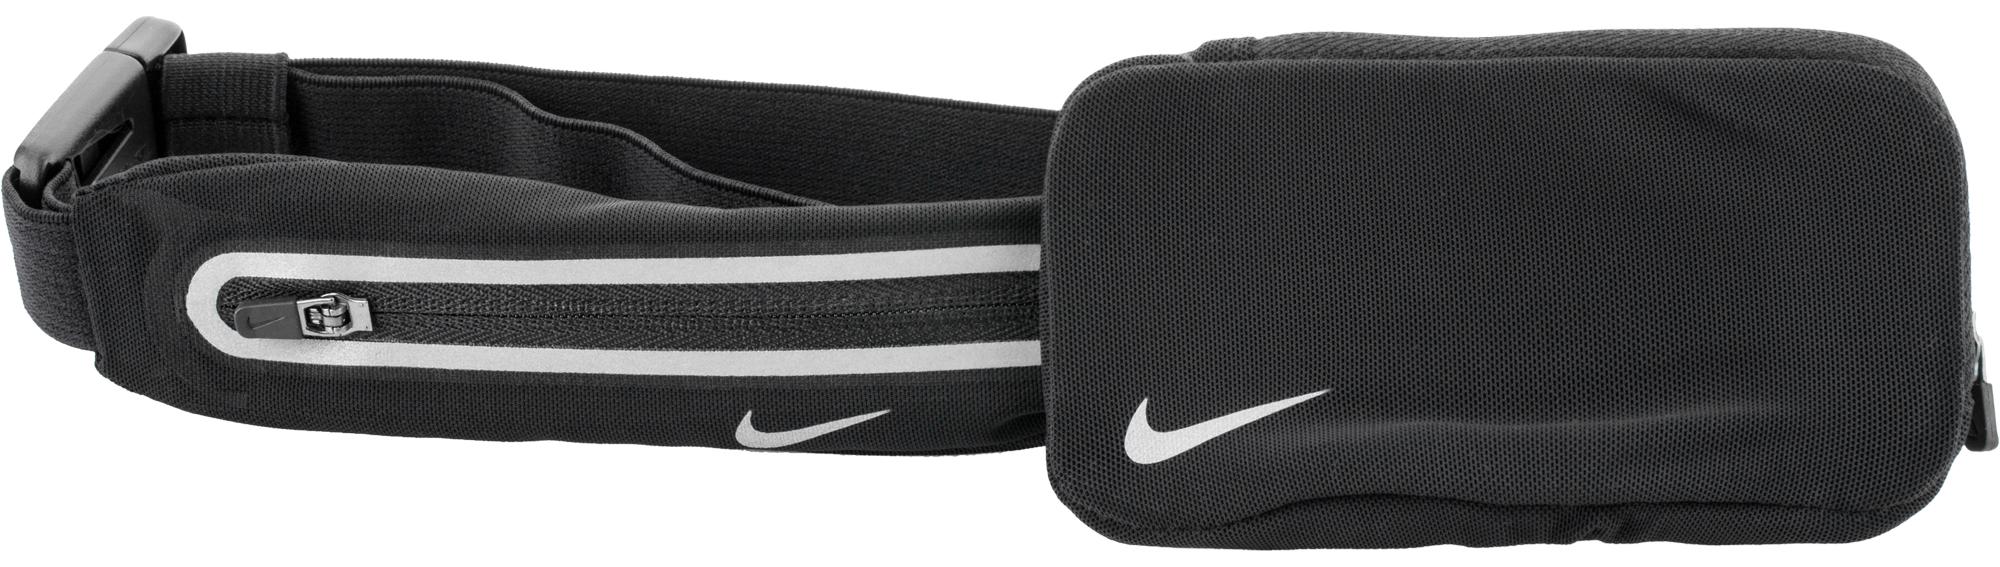 Nike Сумка на пояс Nike Lean 2